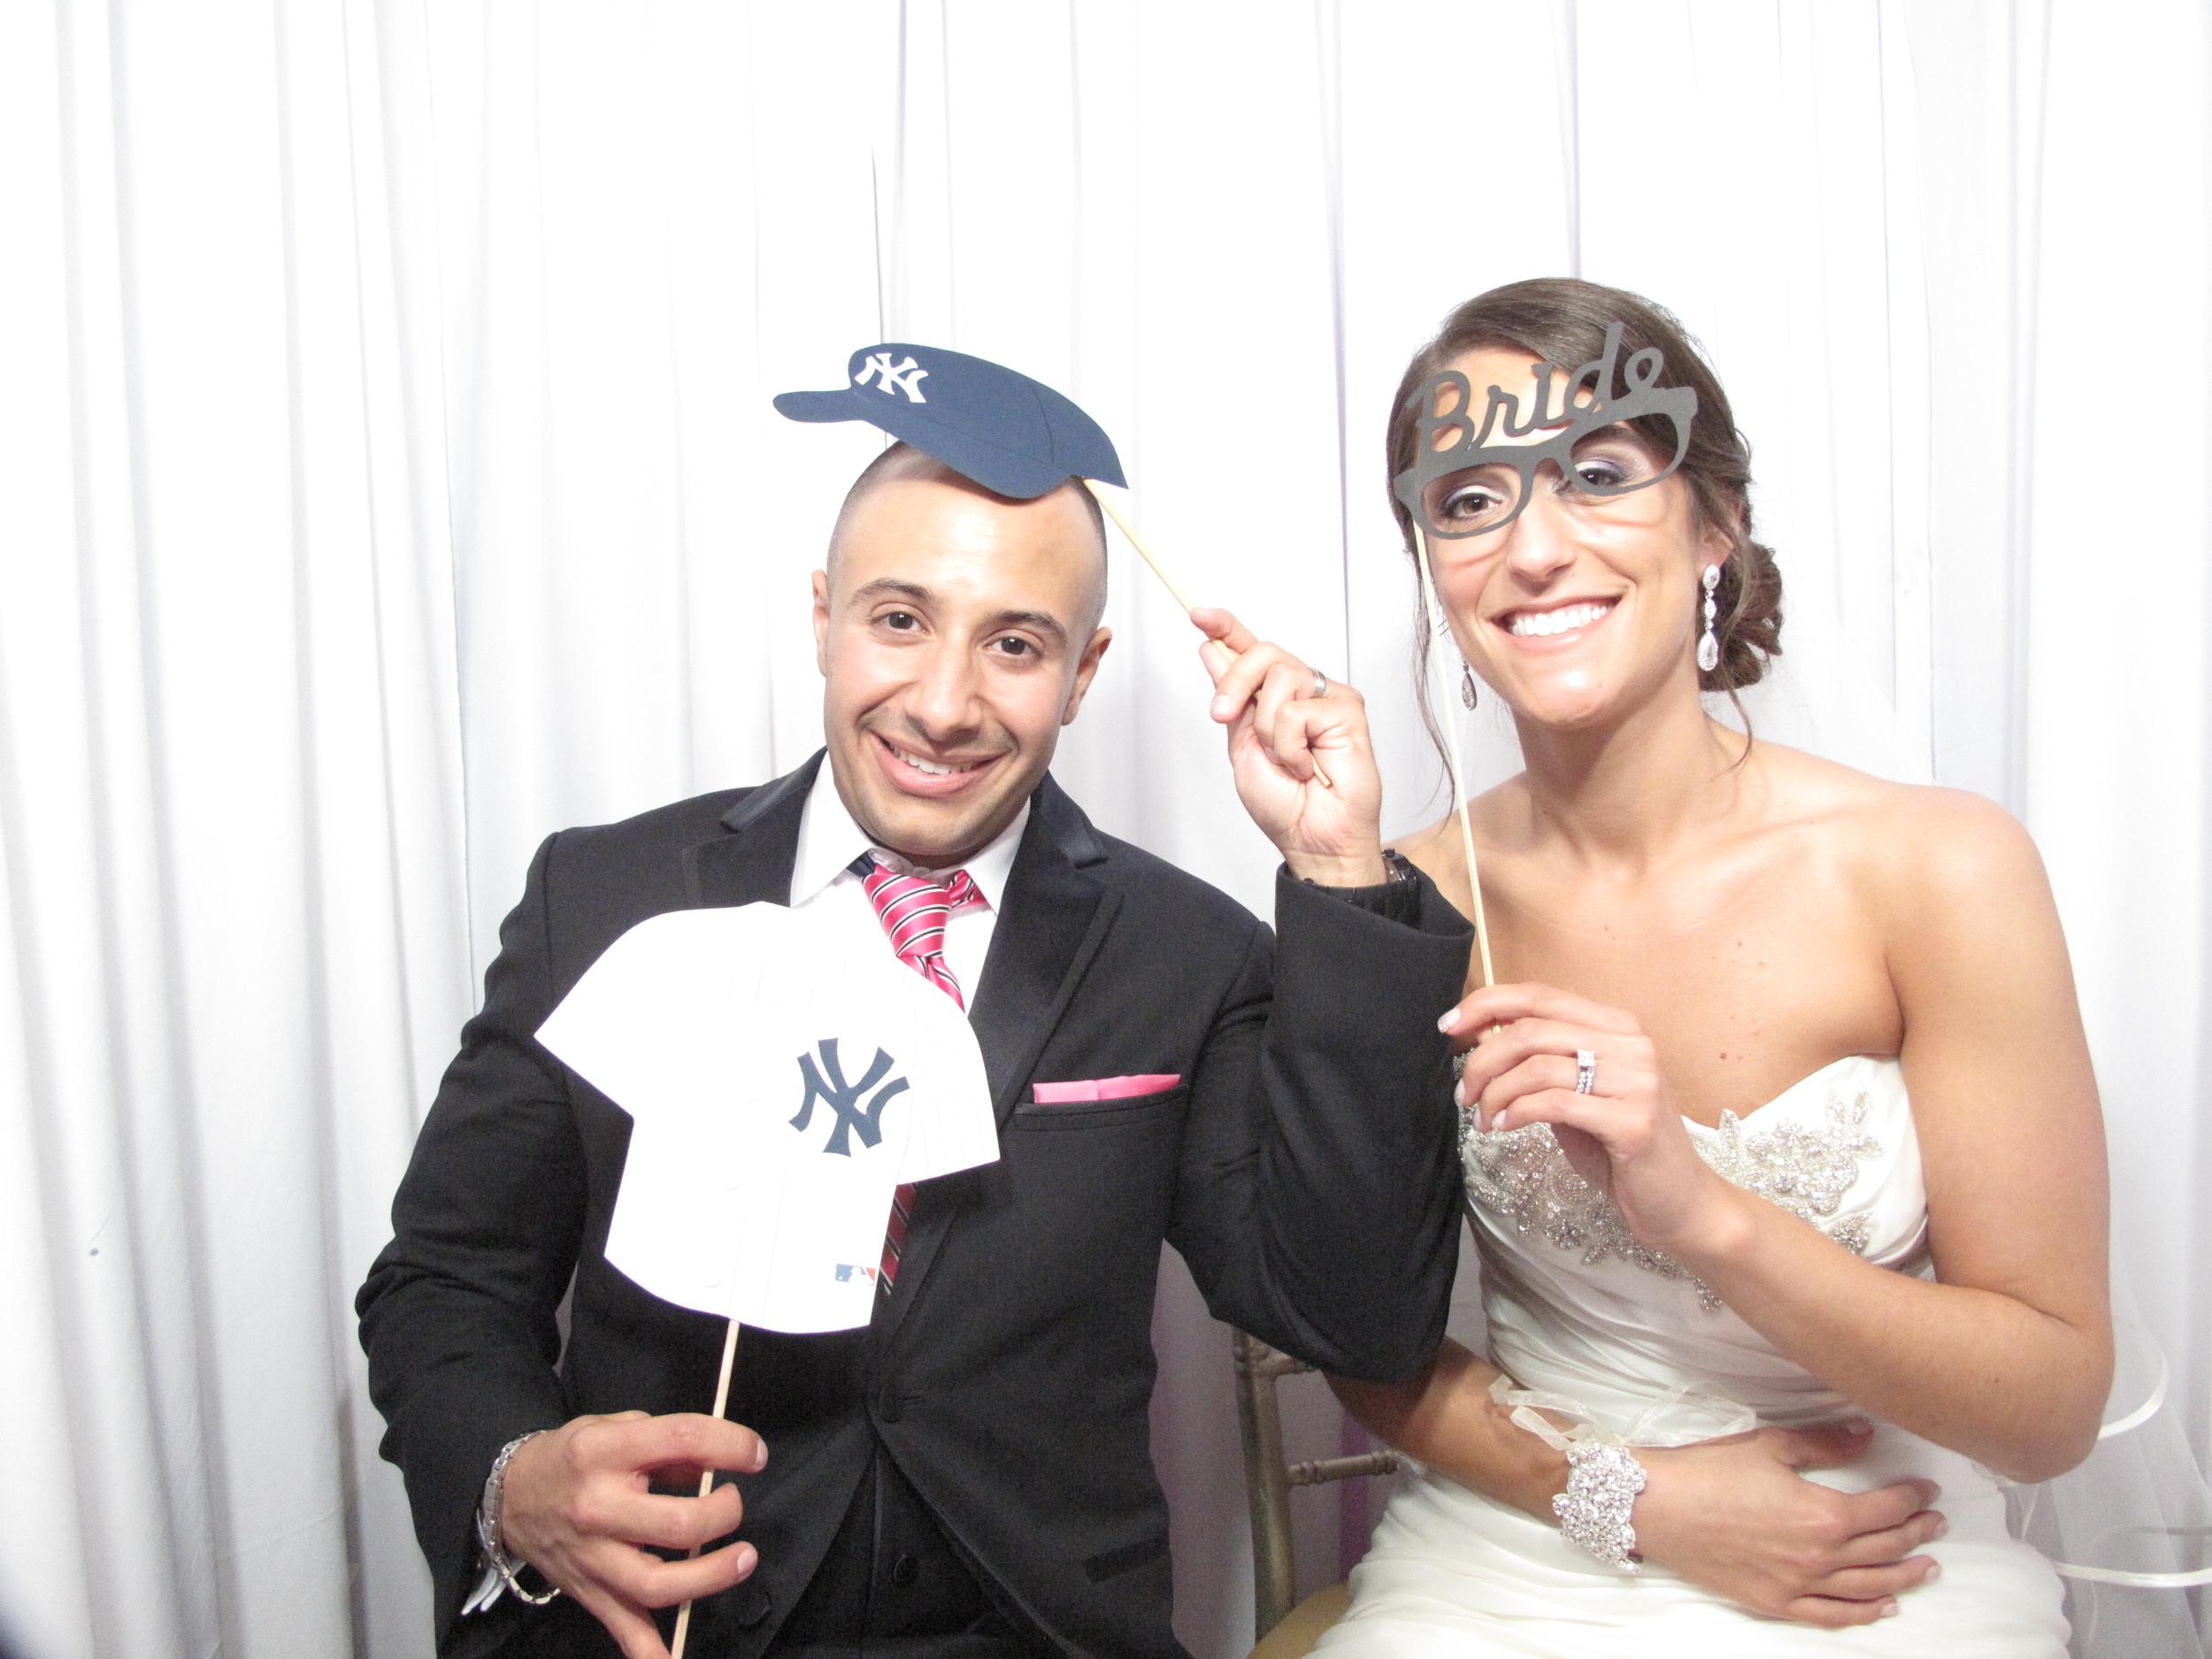 Snapshot Photobooths at Season's in Washington Township, New Jersey